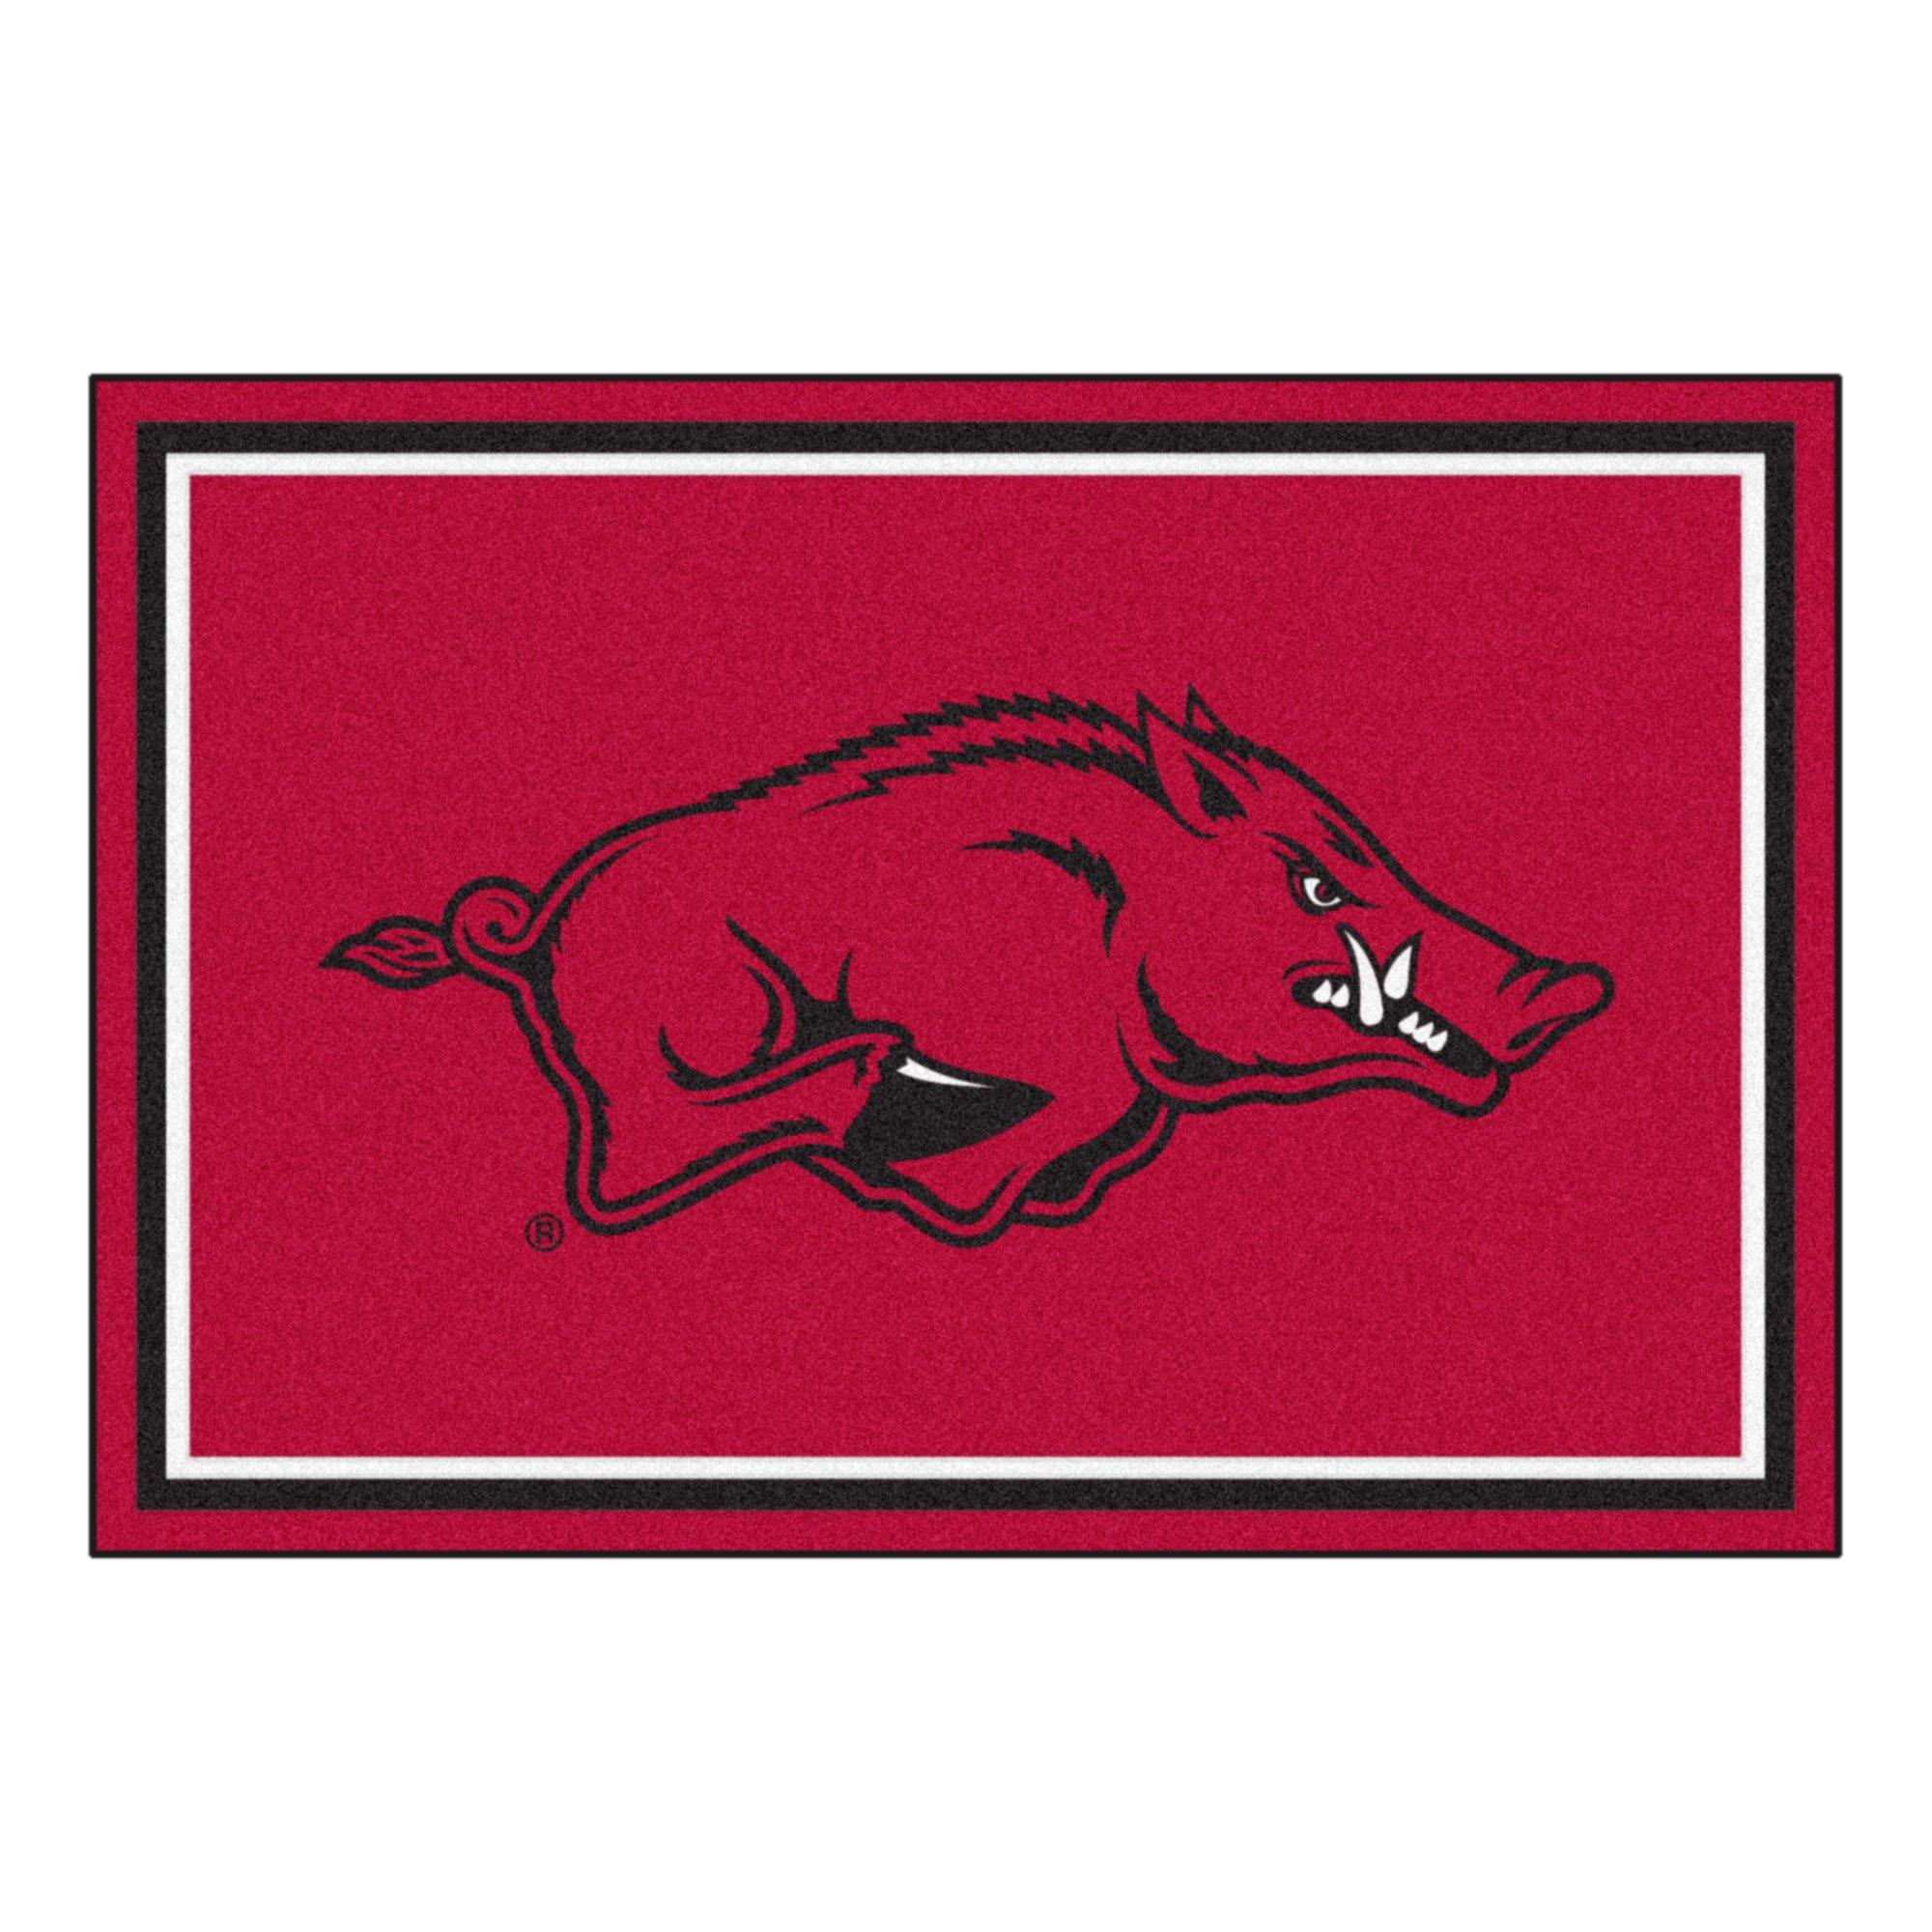 FANMATS NCAA University of Arkansas Razorbacks Nylon Face 5X8 Plush Rug by Fanmats (Image #1)